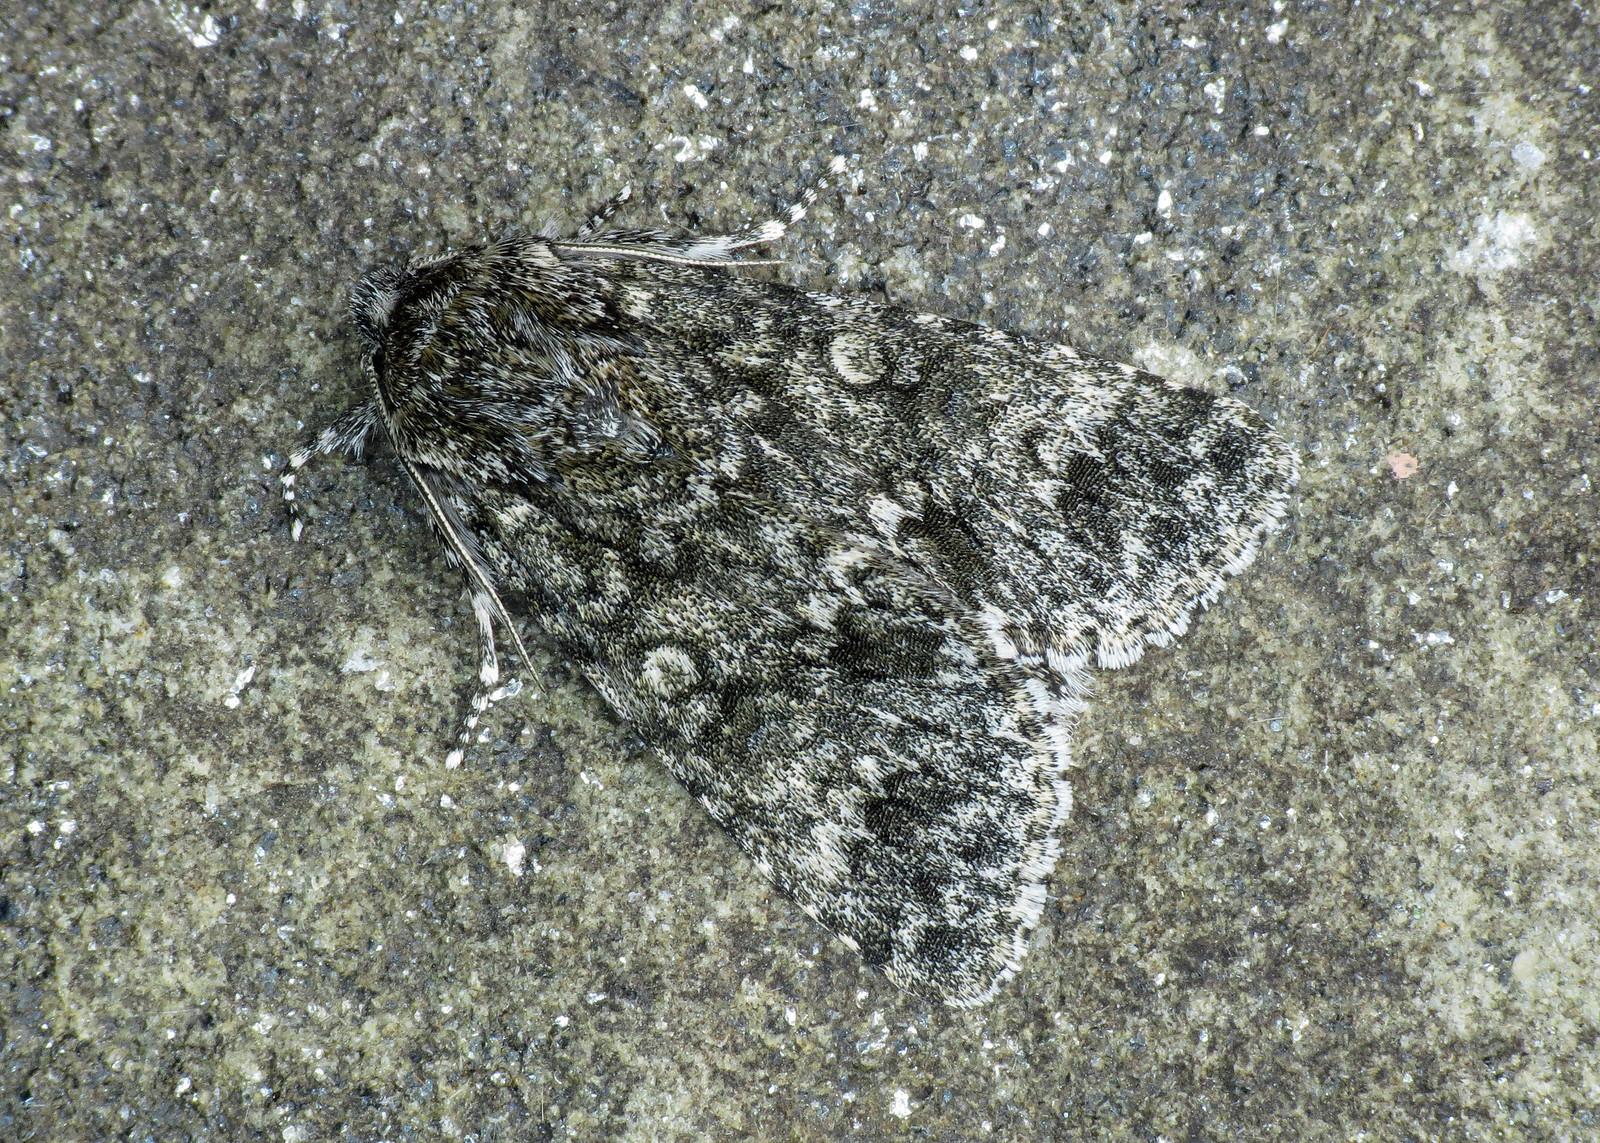 2278 Poplar Grey - Acronicta megacephala